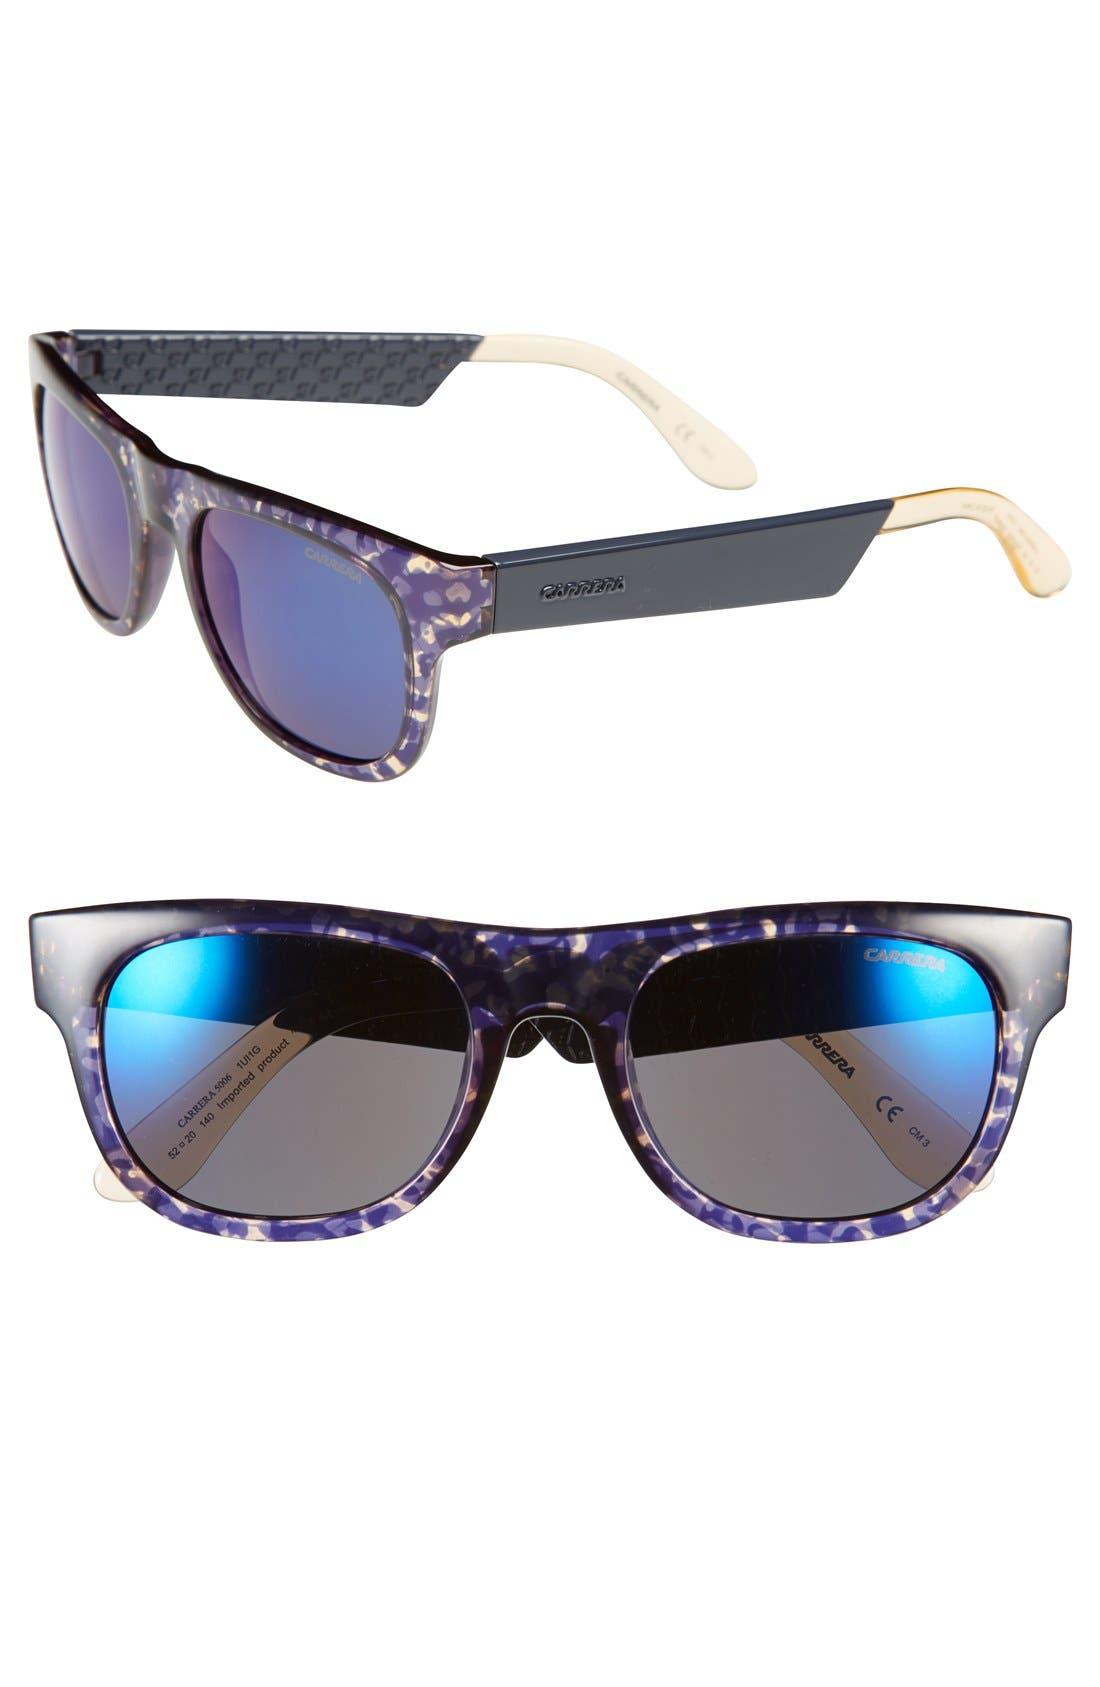 Main Image - Carrera Eyewear 52mm Sunglasses